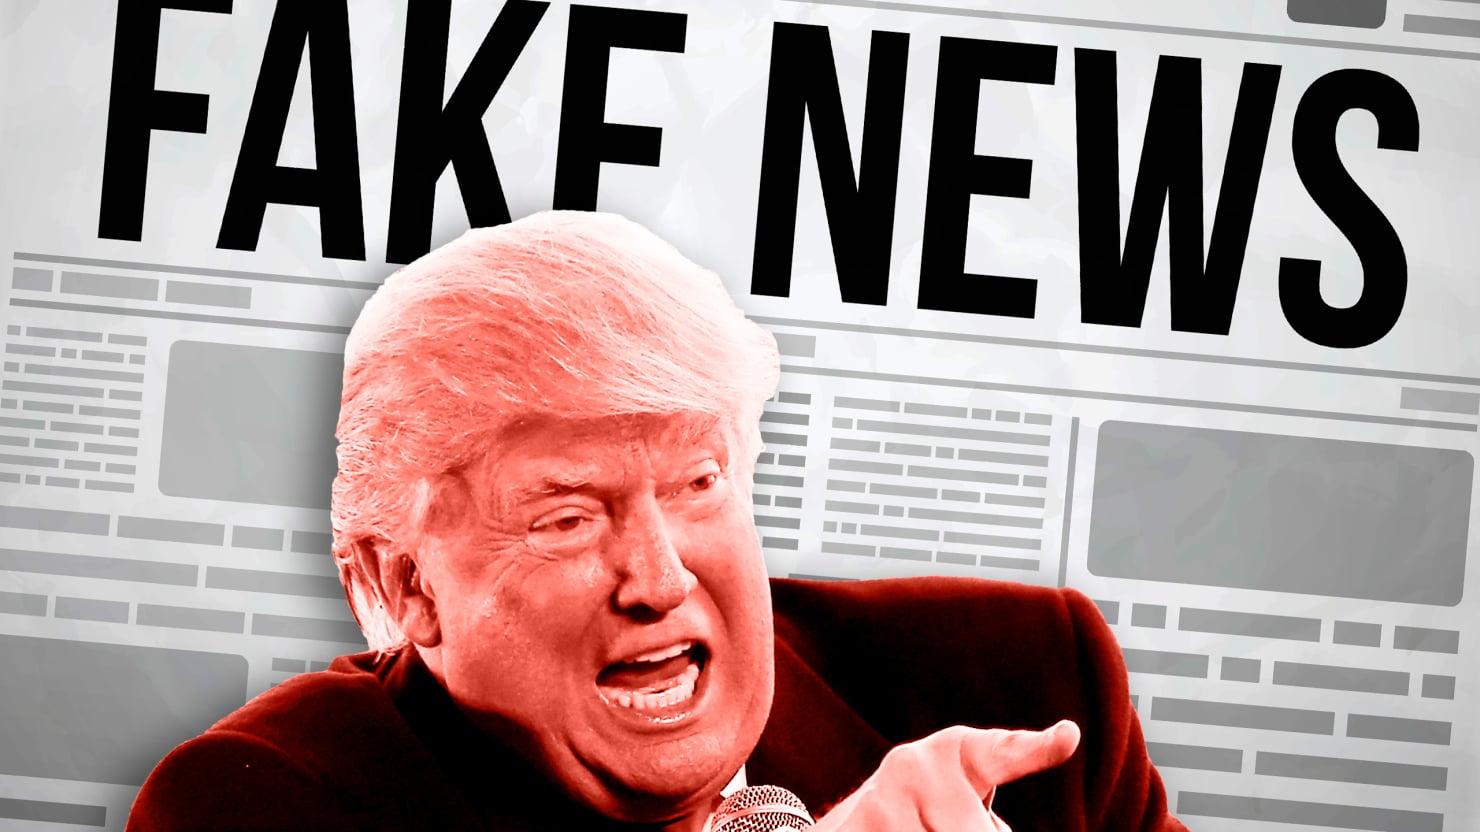 170217-whitney-trump-fake-news-tease_kpakpl